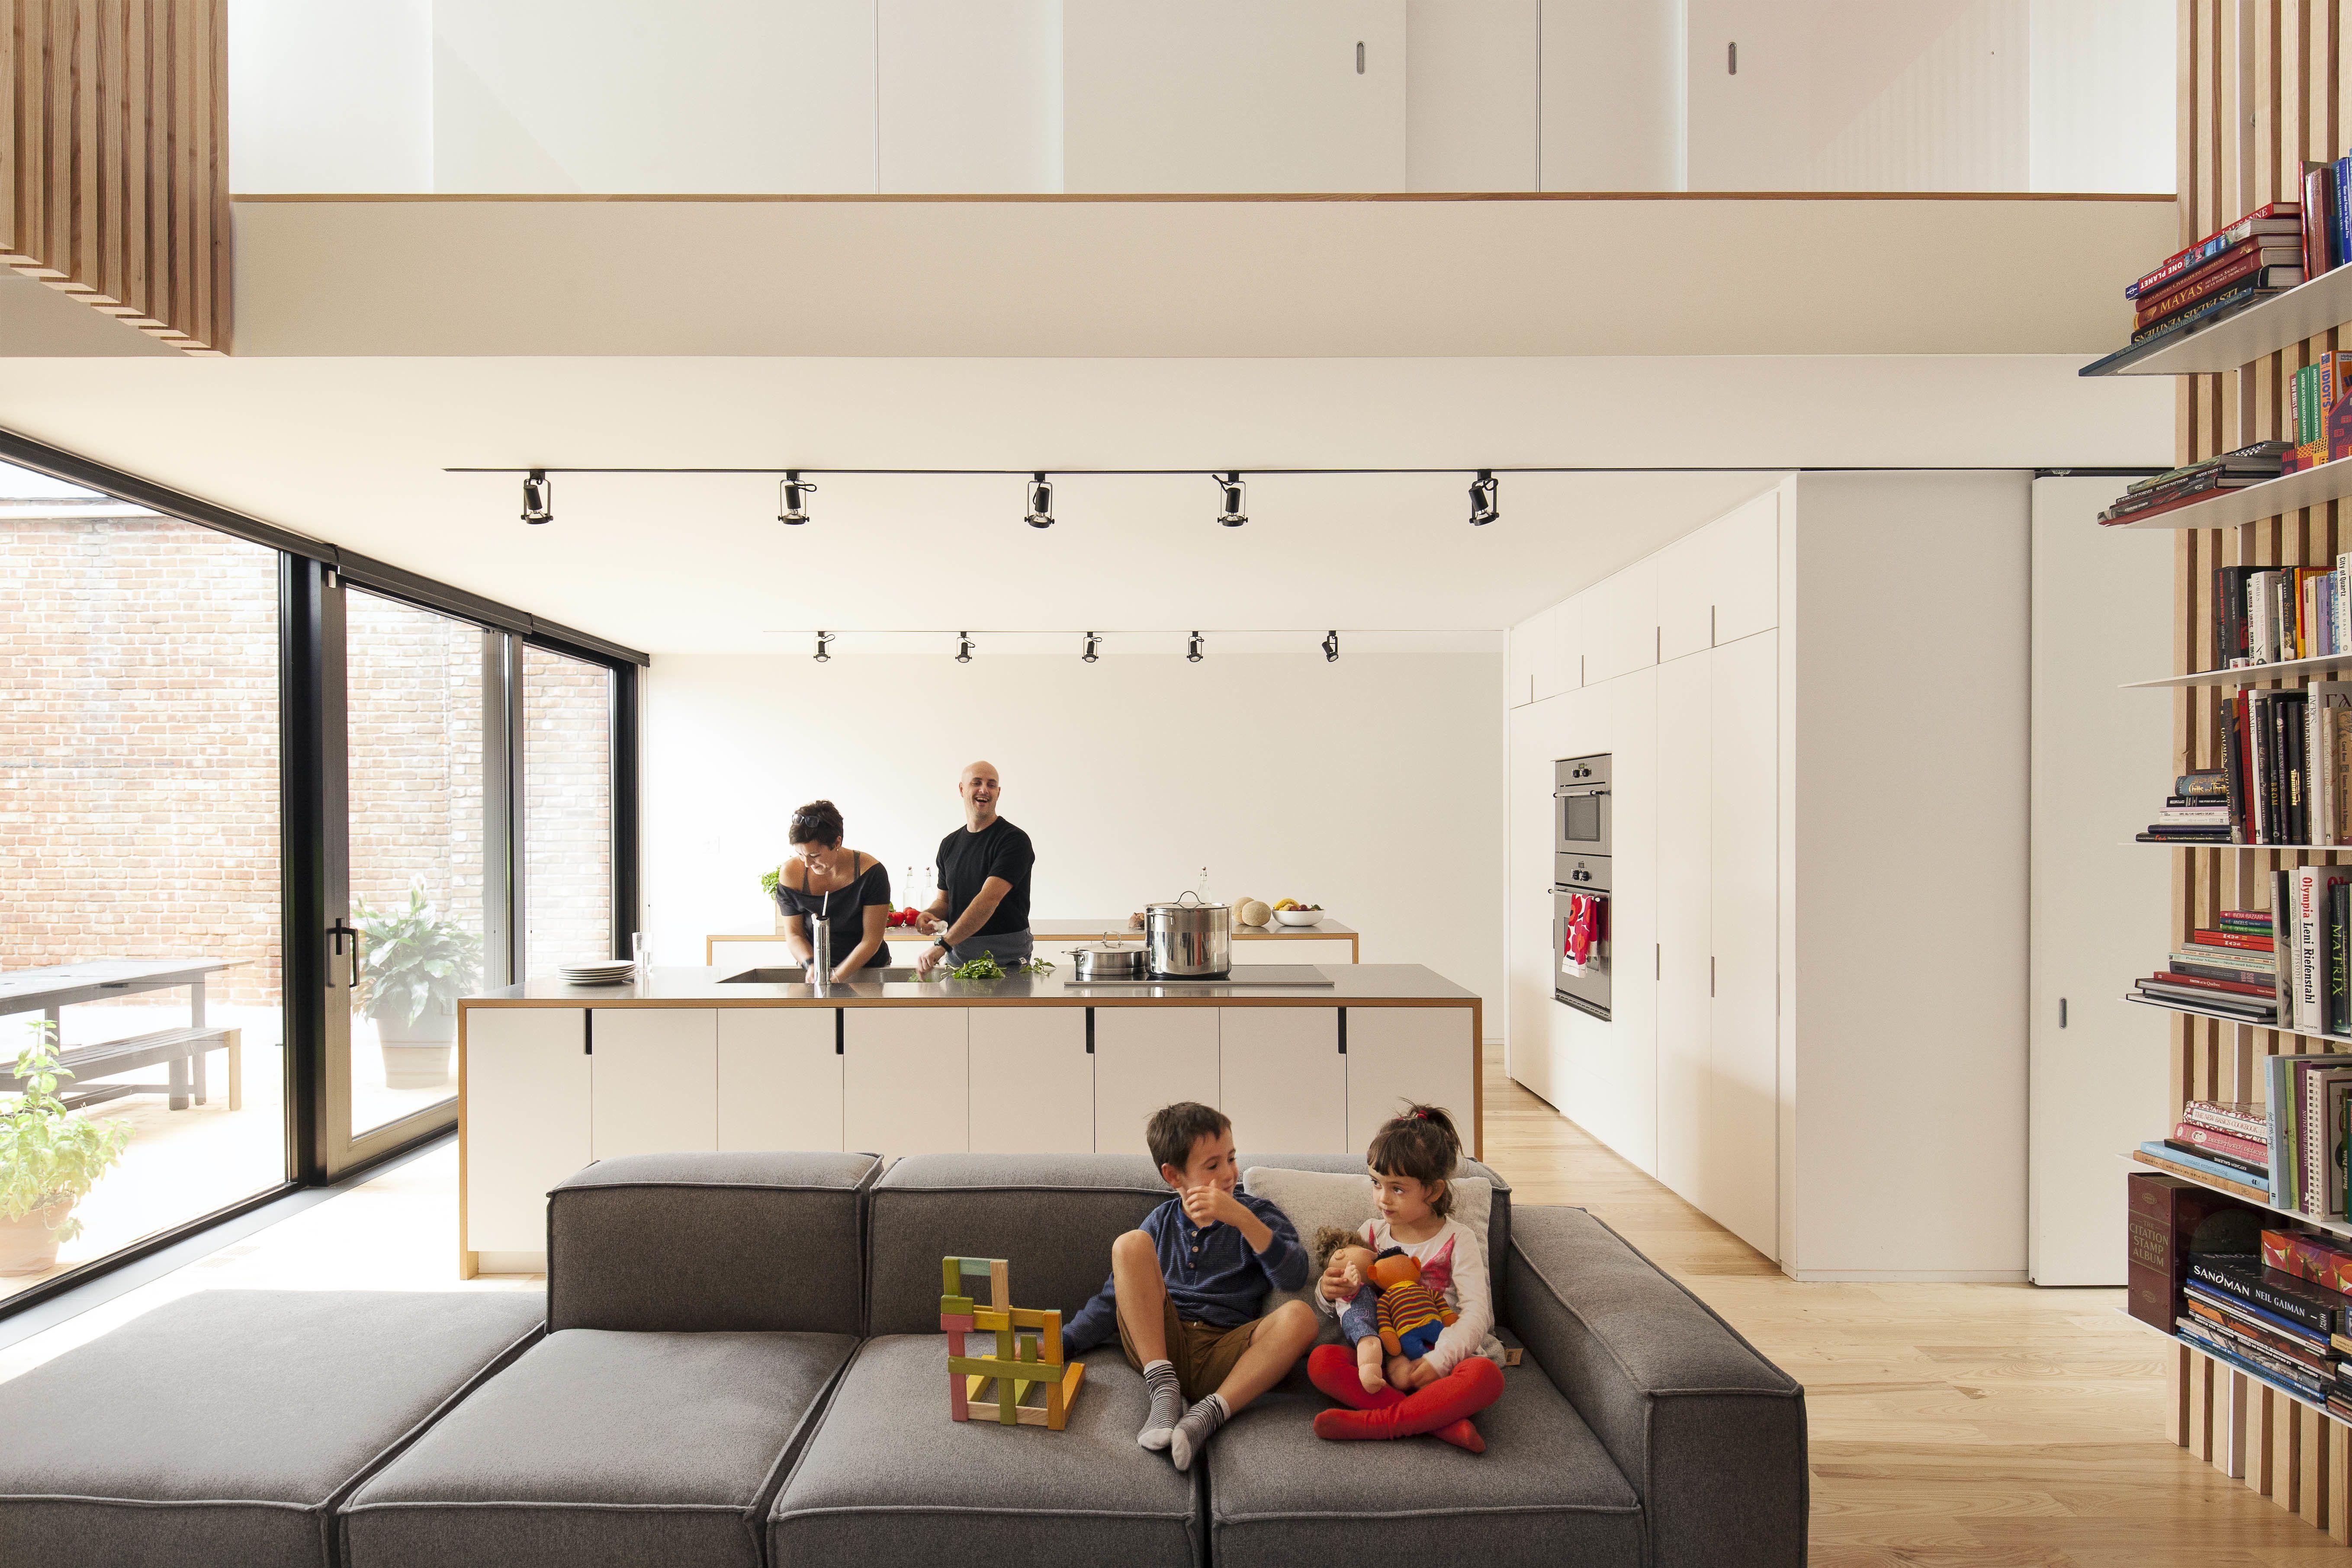 Photo 4 of 15 in A Transformative Duplex Renovation in